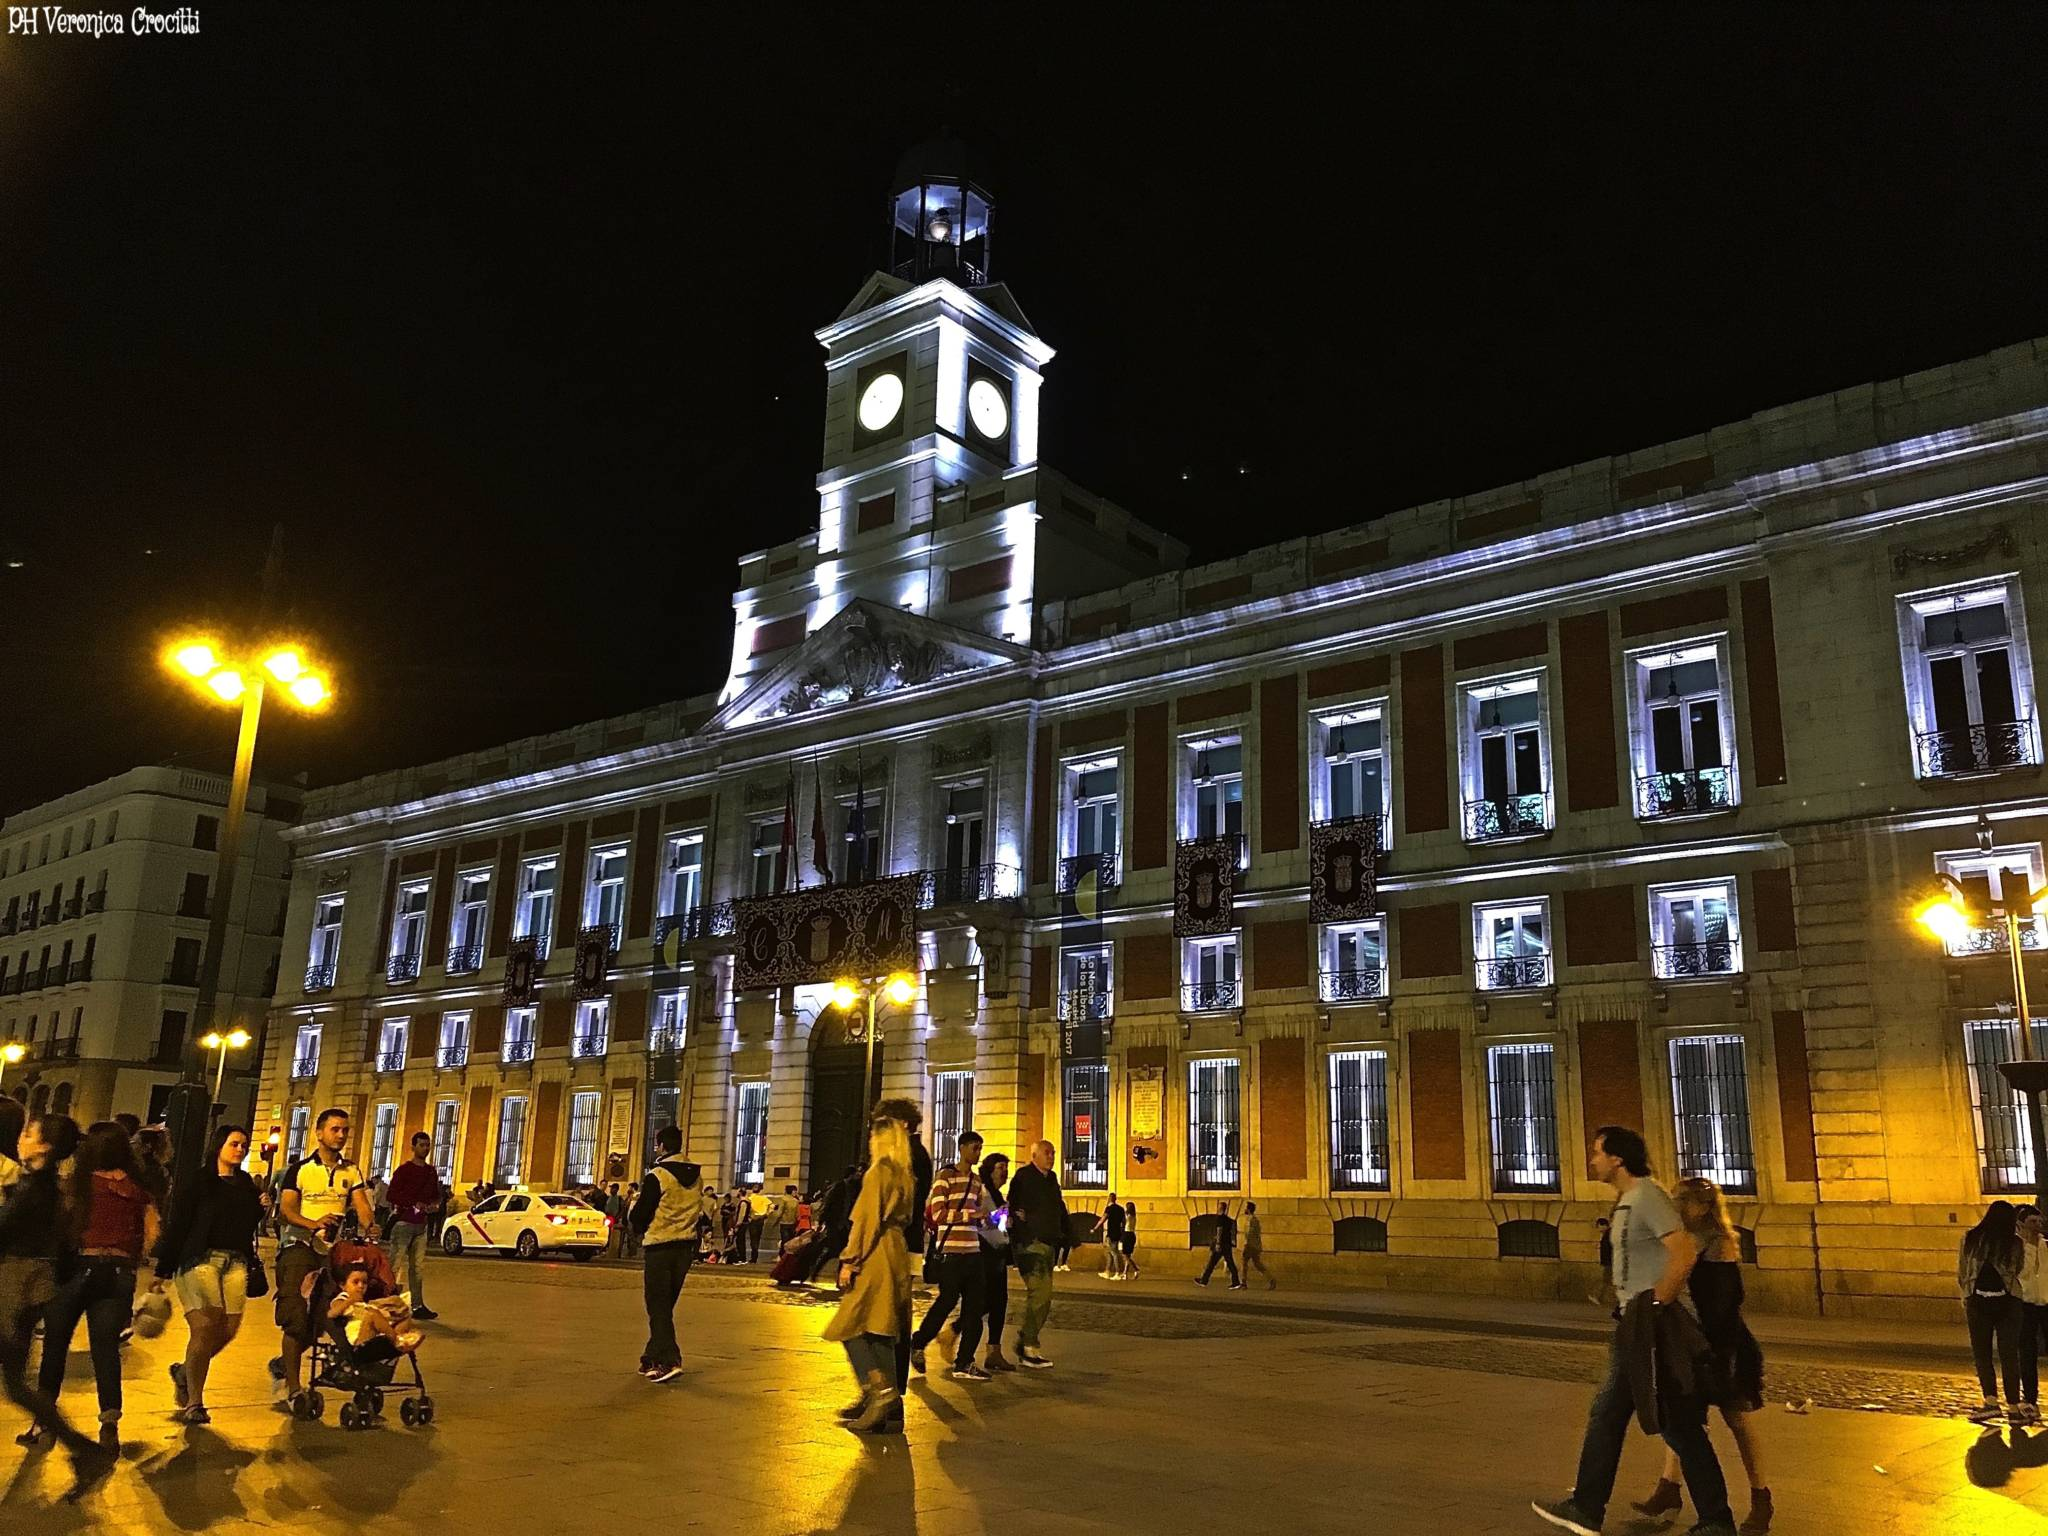 Puerta del Sol - Madrid, Spagna